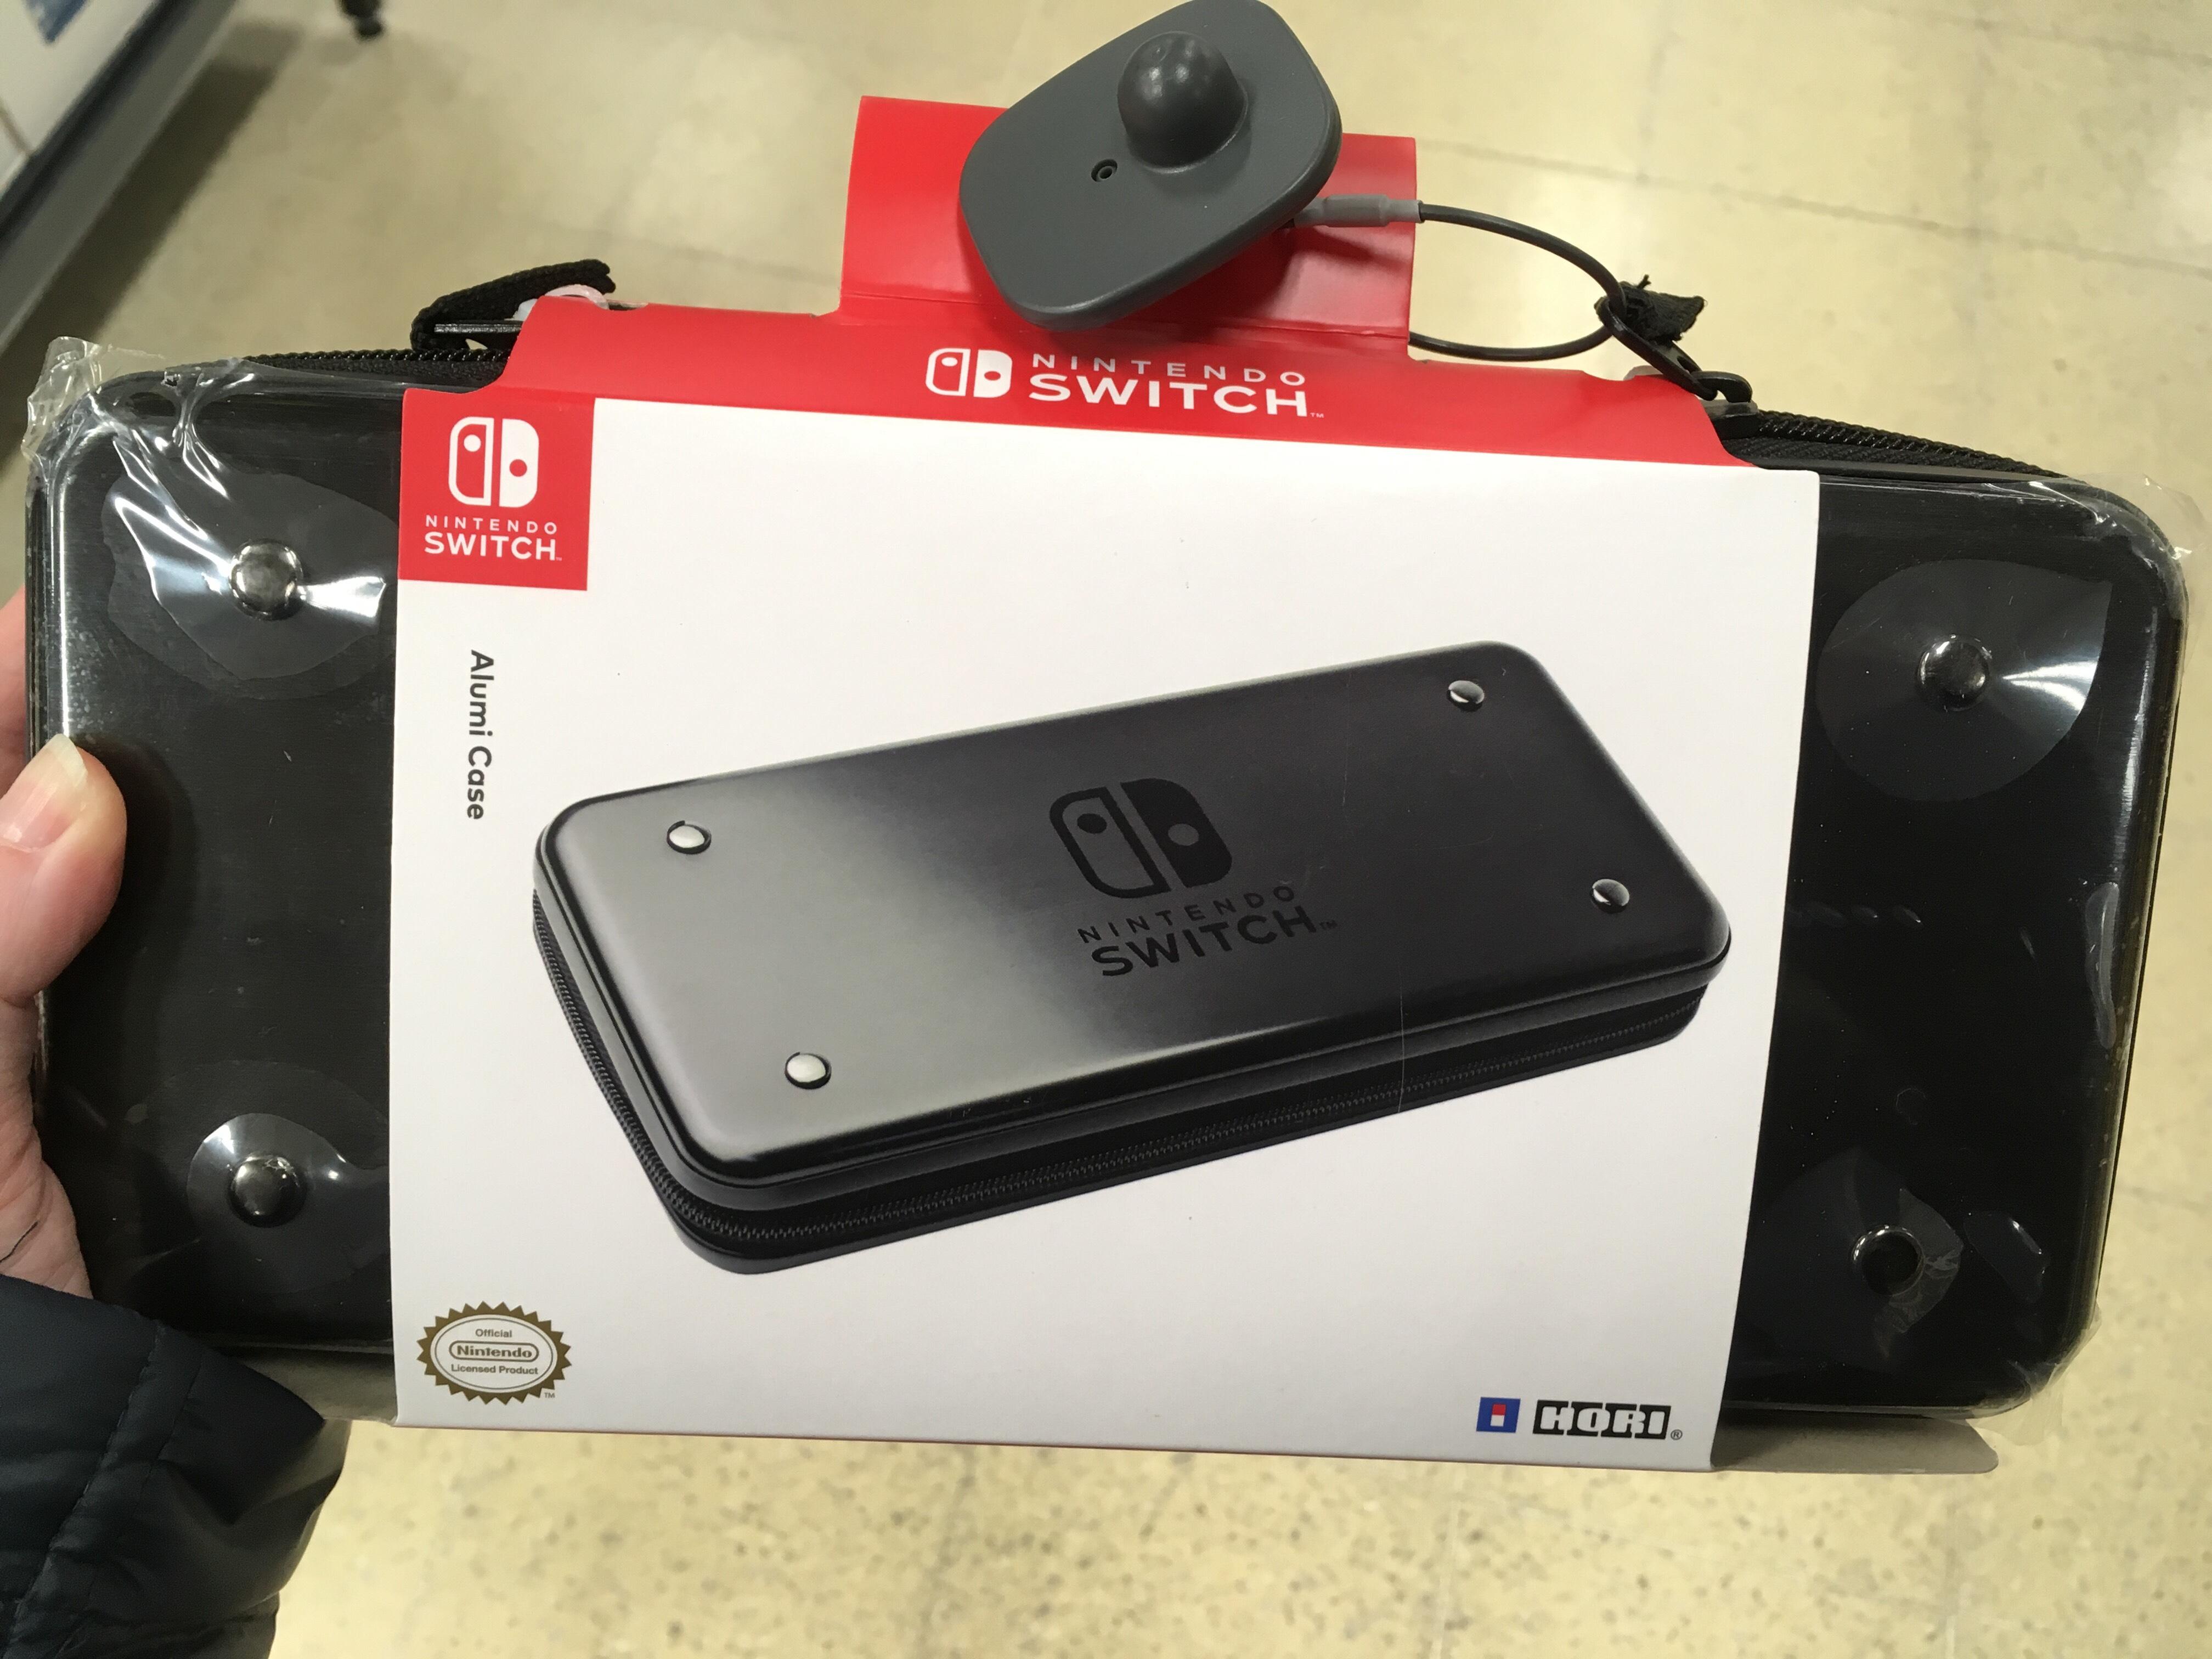 Nintendo Switch Hori Aluminium Case - £10 Instore at Tesco (Risca, Wales)